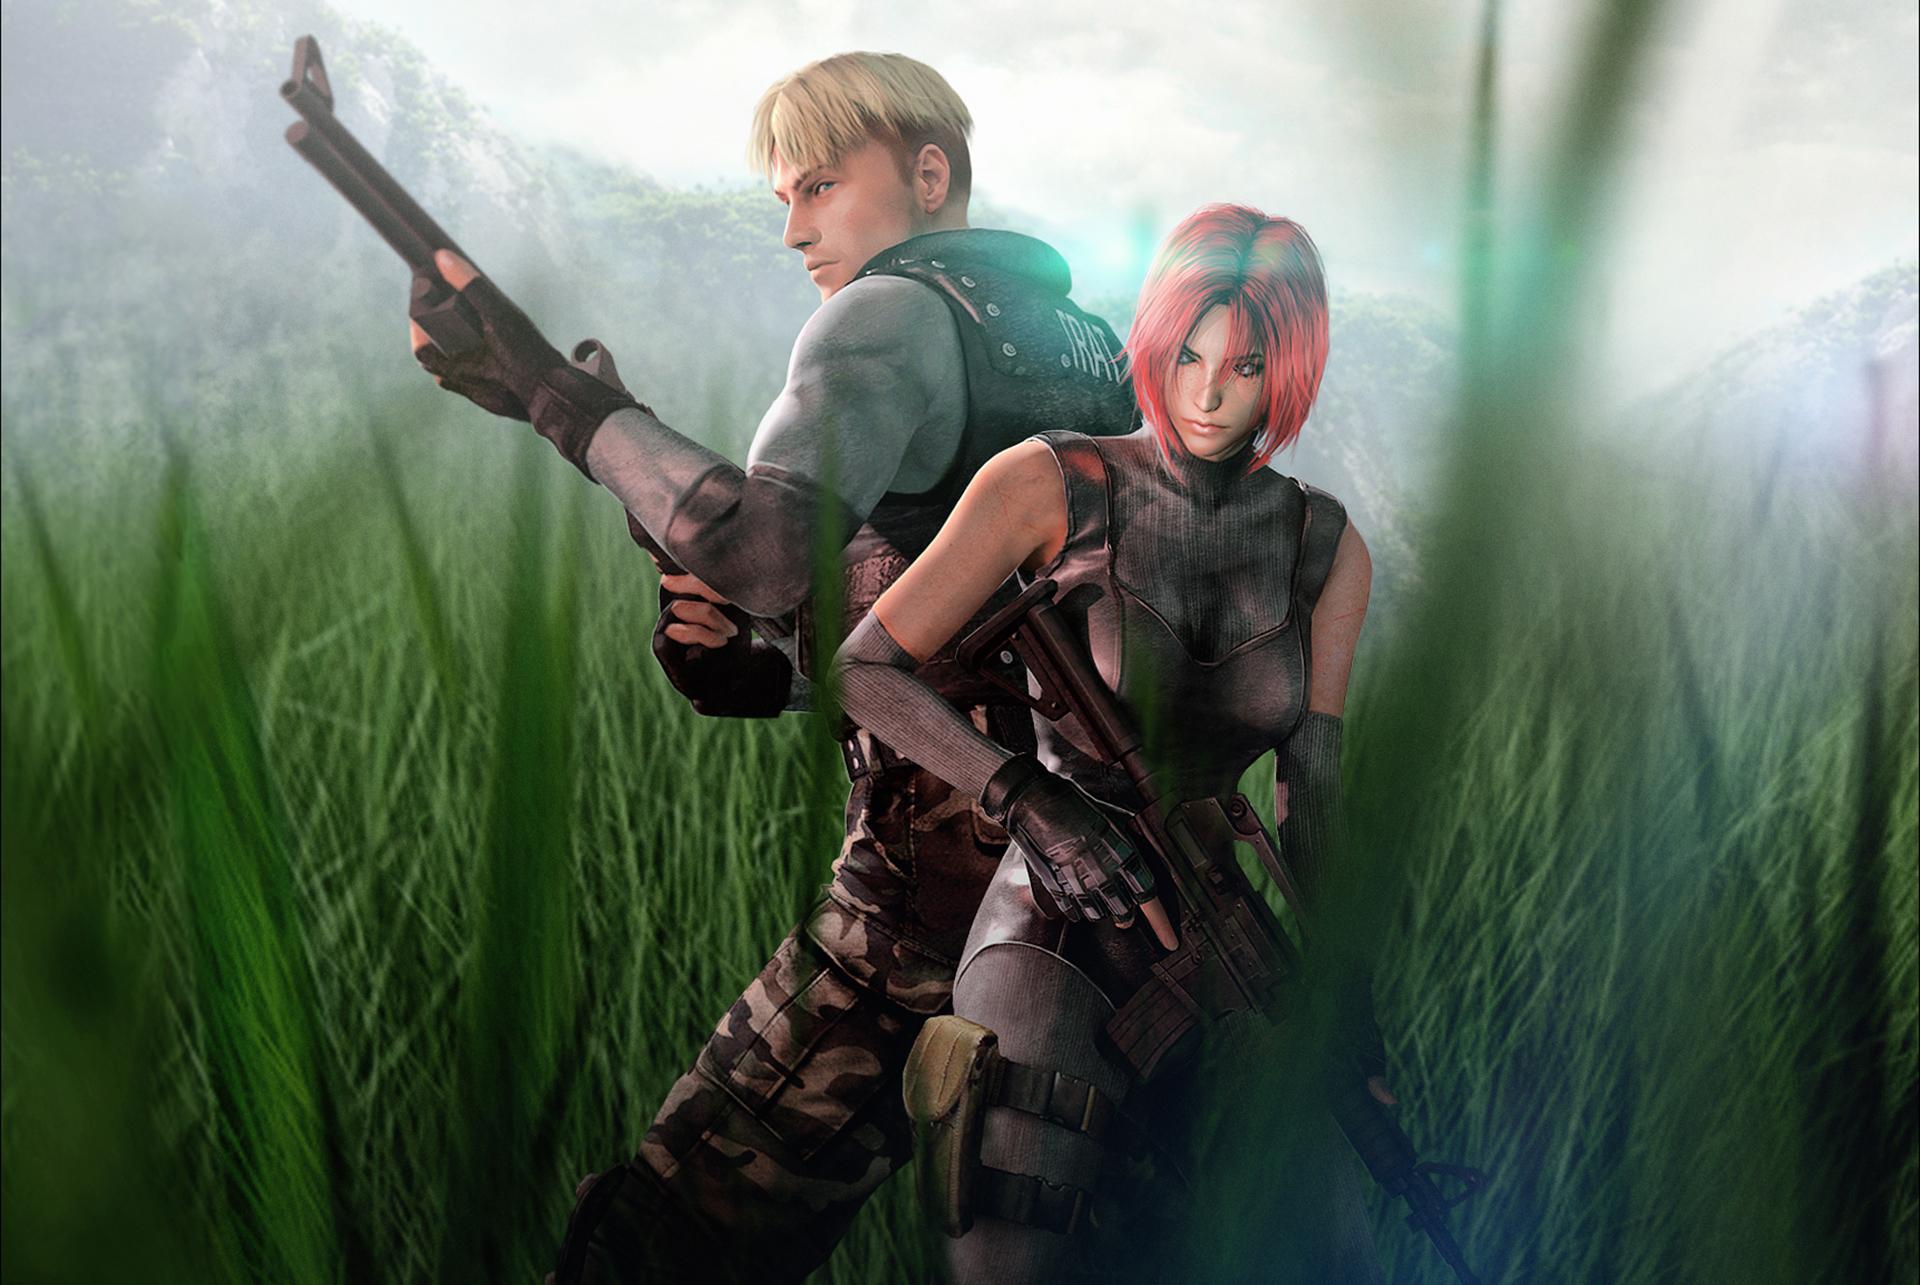 Hintergrundbilder Dino Crisis Soldaten Mann S.O.R.T. agent T.R.A.T. Soldier Dylan Morton Regina fan art Capcom Mädchens Spiele Gras 1920x1285